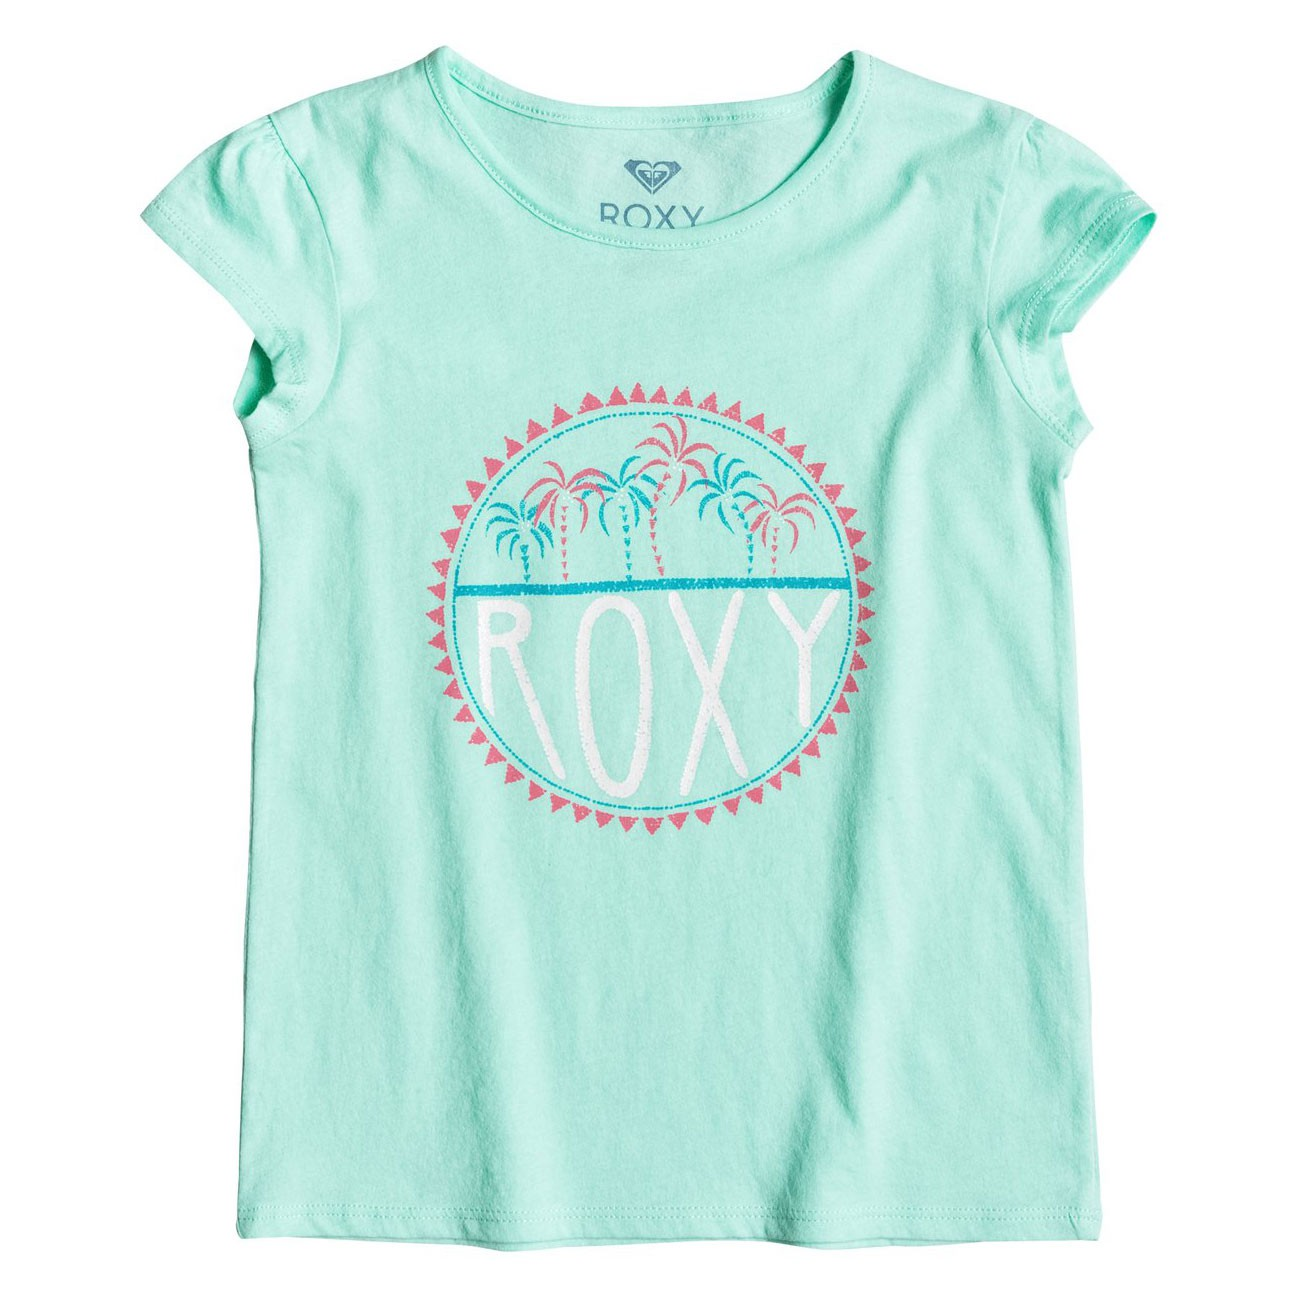 Tričko Roxy Moid Palm Tiny beach glass vel.3 roky 17 + doručení do 24 hodin